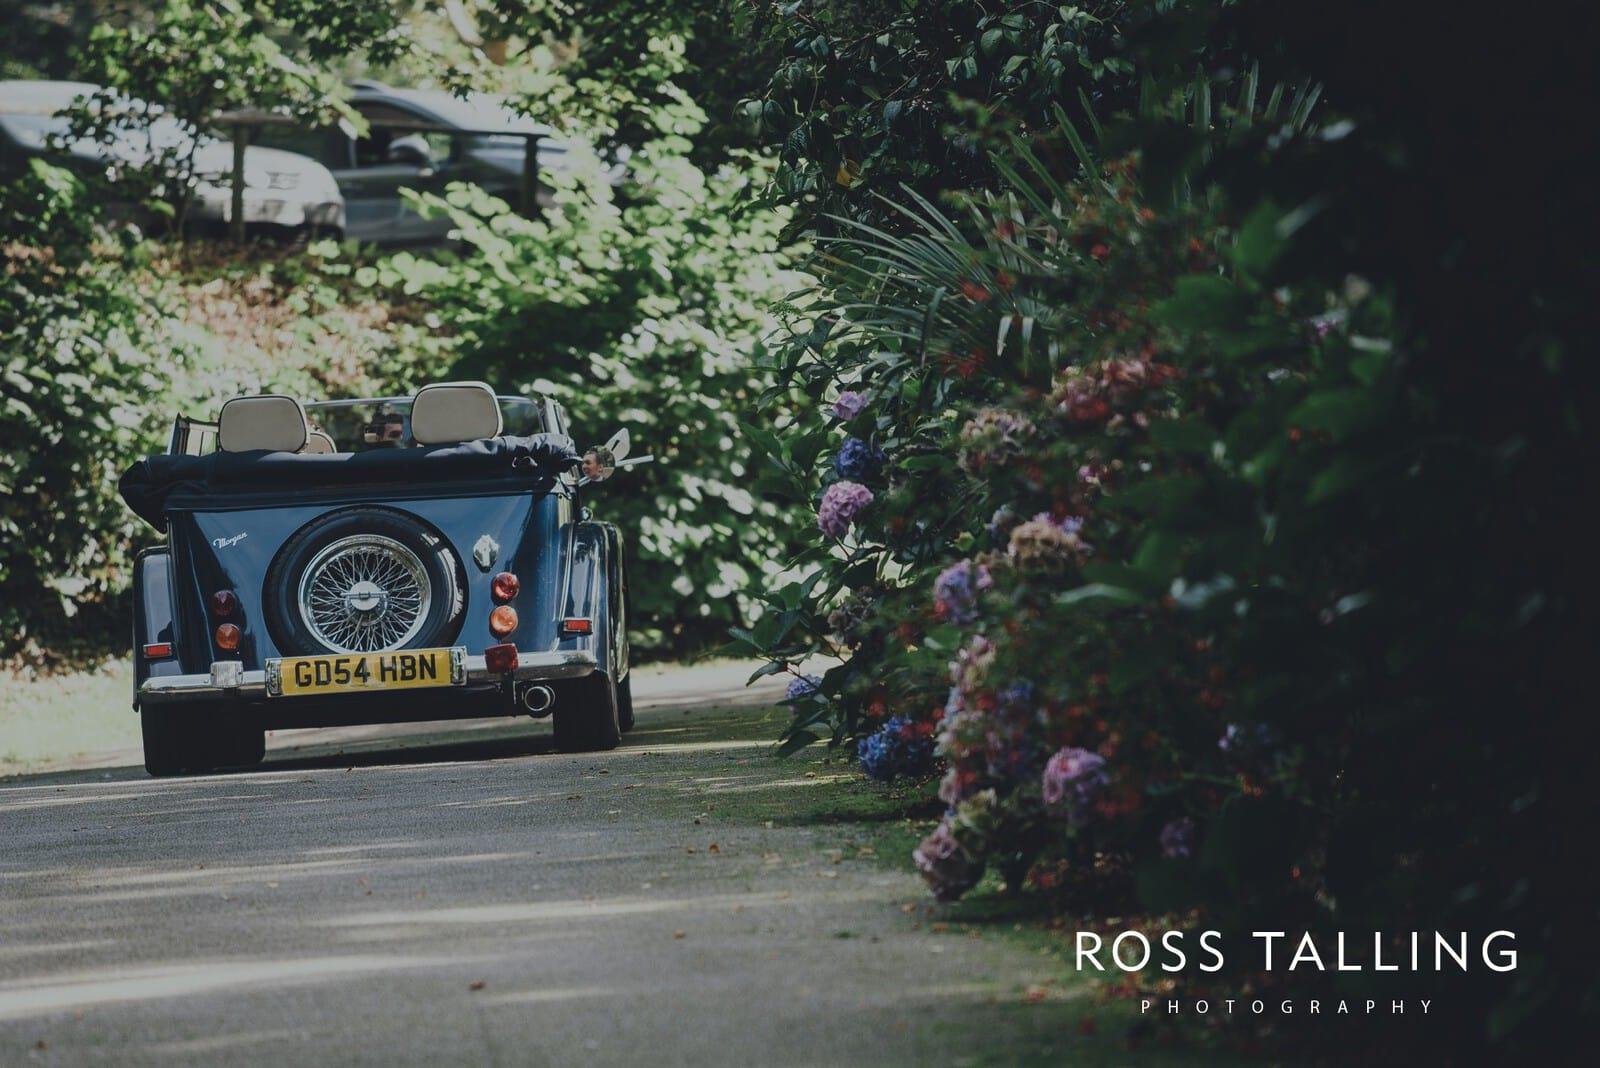 laura-matts-rosevine-hotel-wedding-photography-cornwall_0102